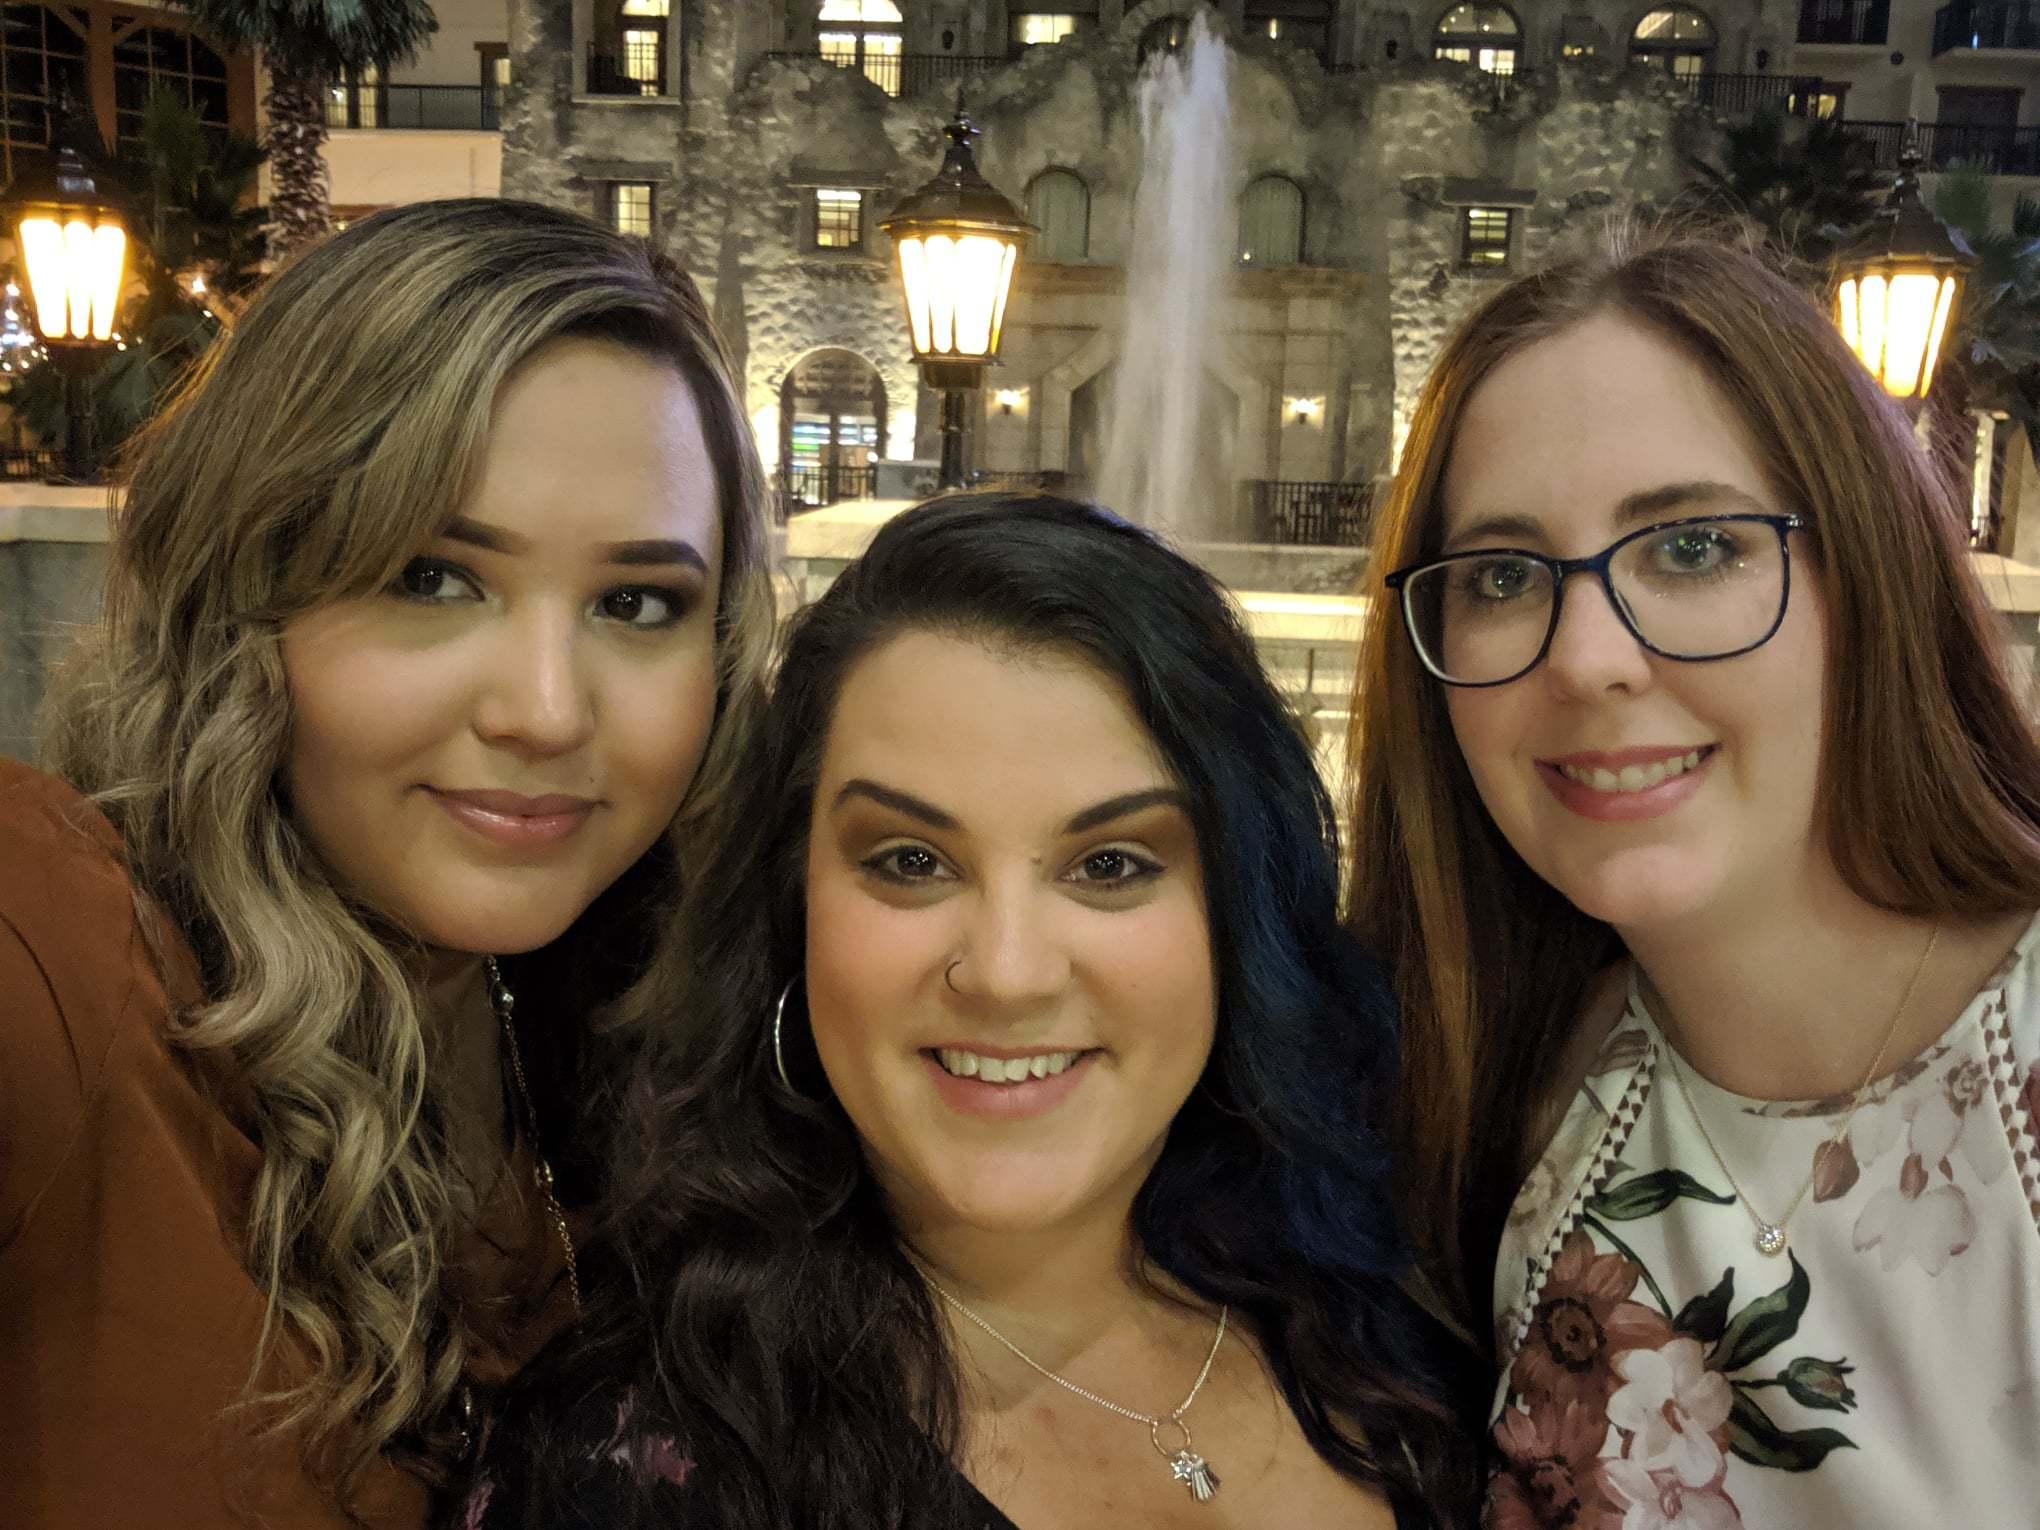 Photo of Karen, Nikki, and Brittney